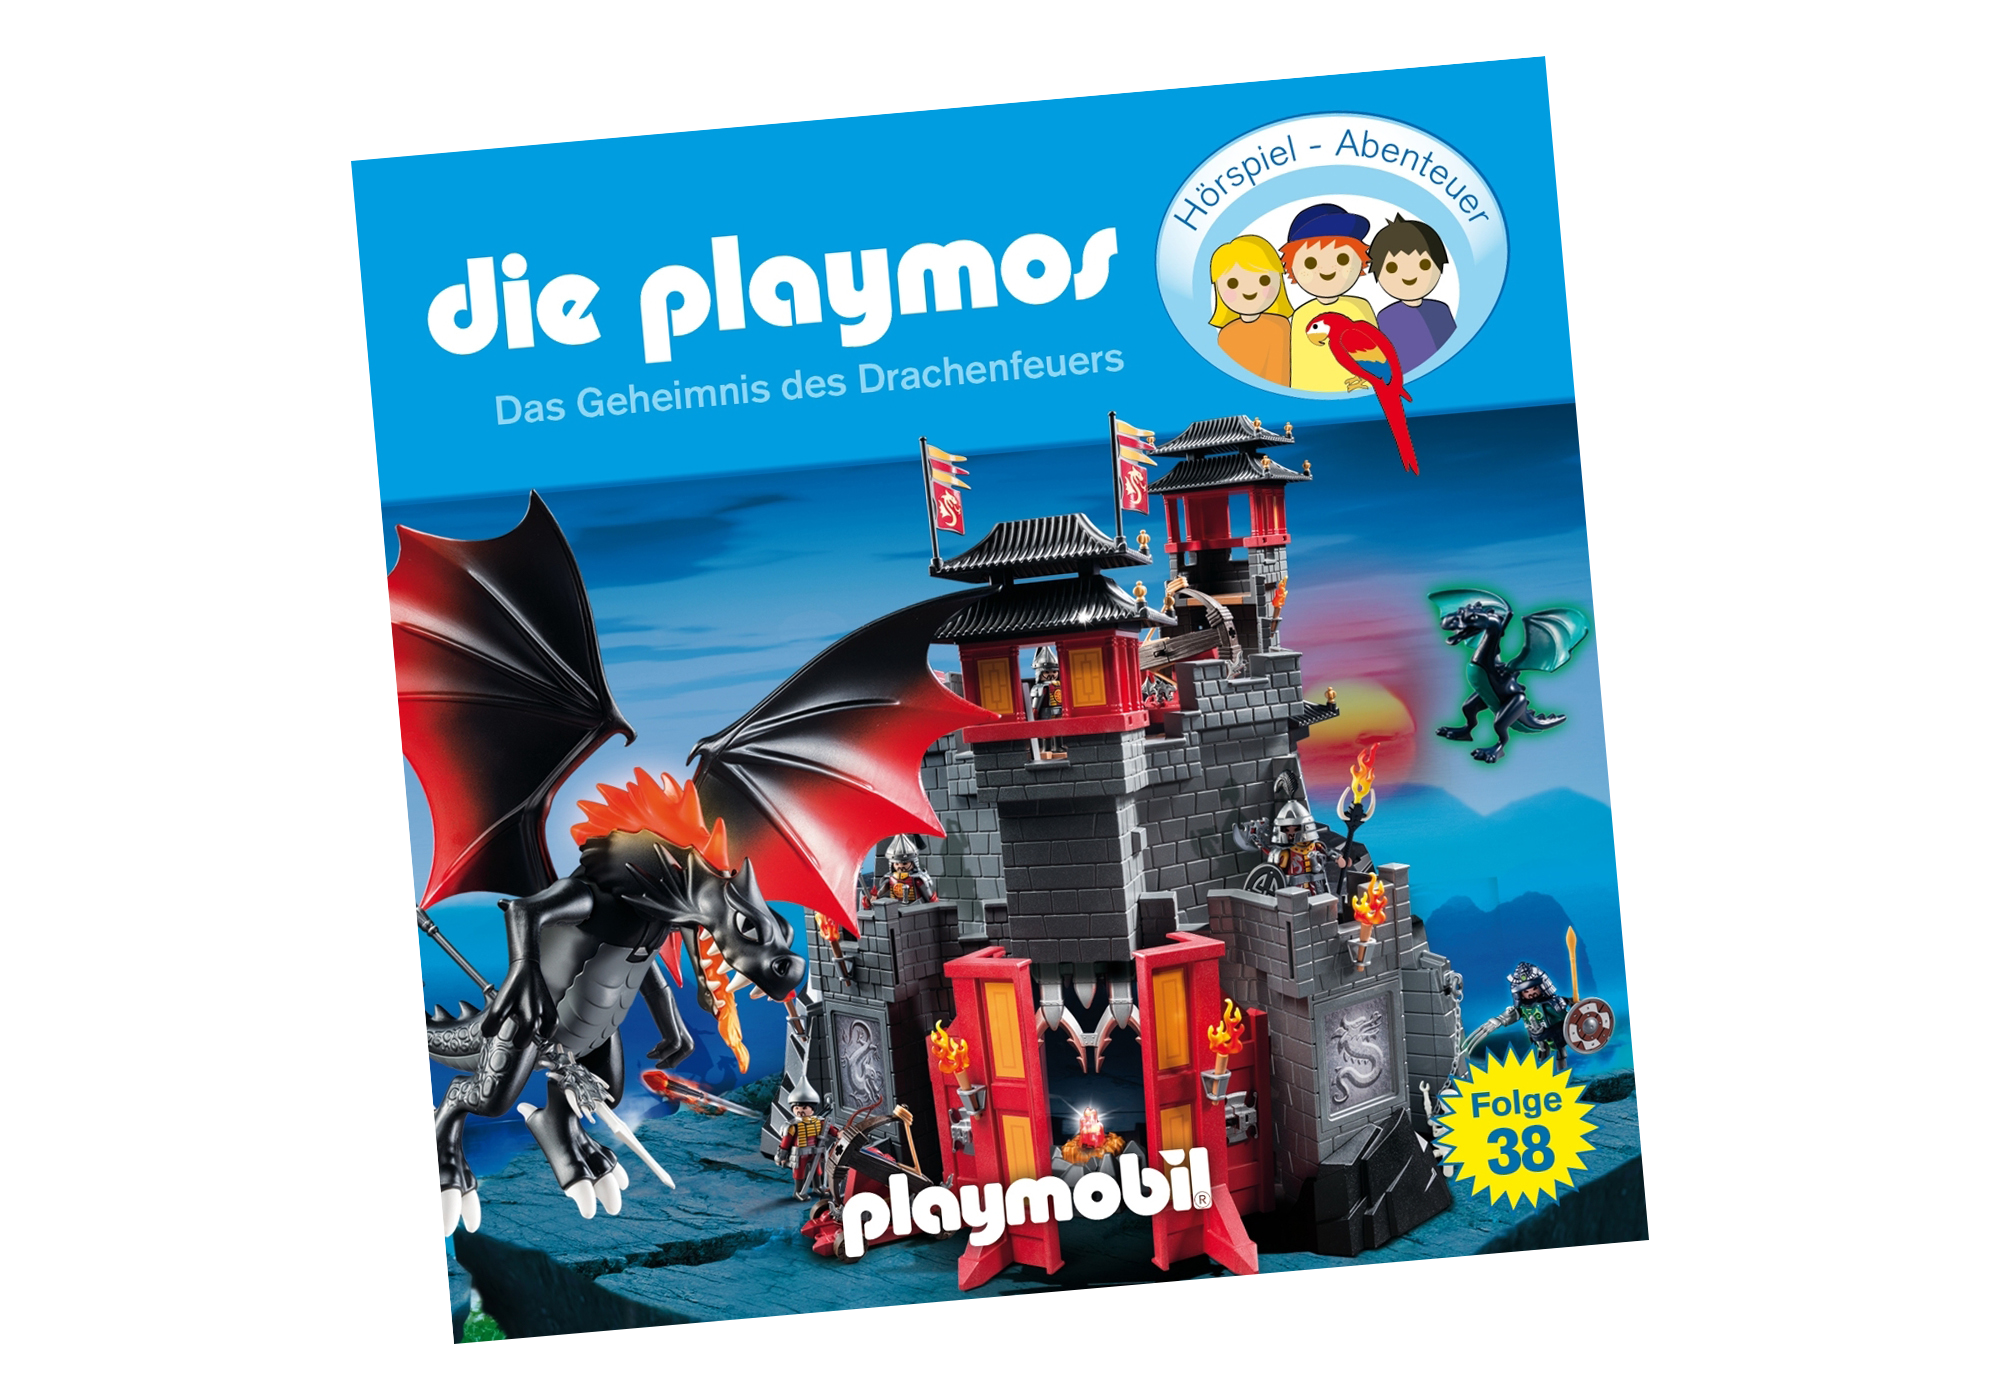 http://media.playmobil.com/i/playmobil/80451_product_detail